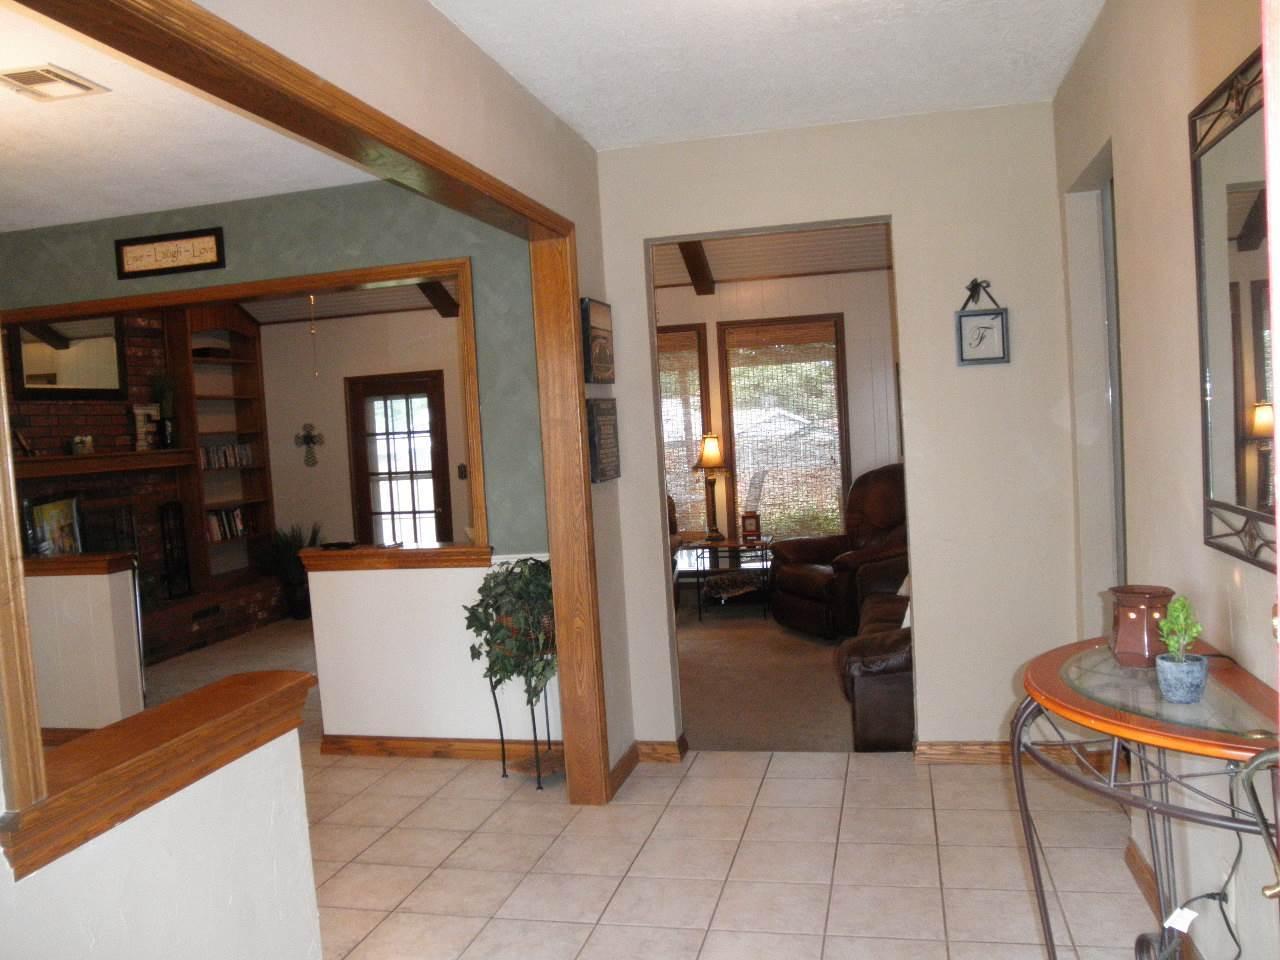 Sold Cross Sale W/ MLS | 2805 Ames  Ponca City, OK  11